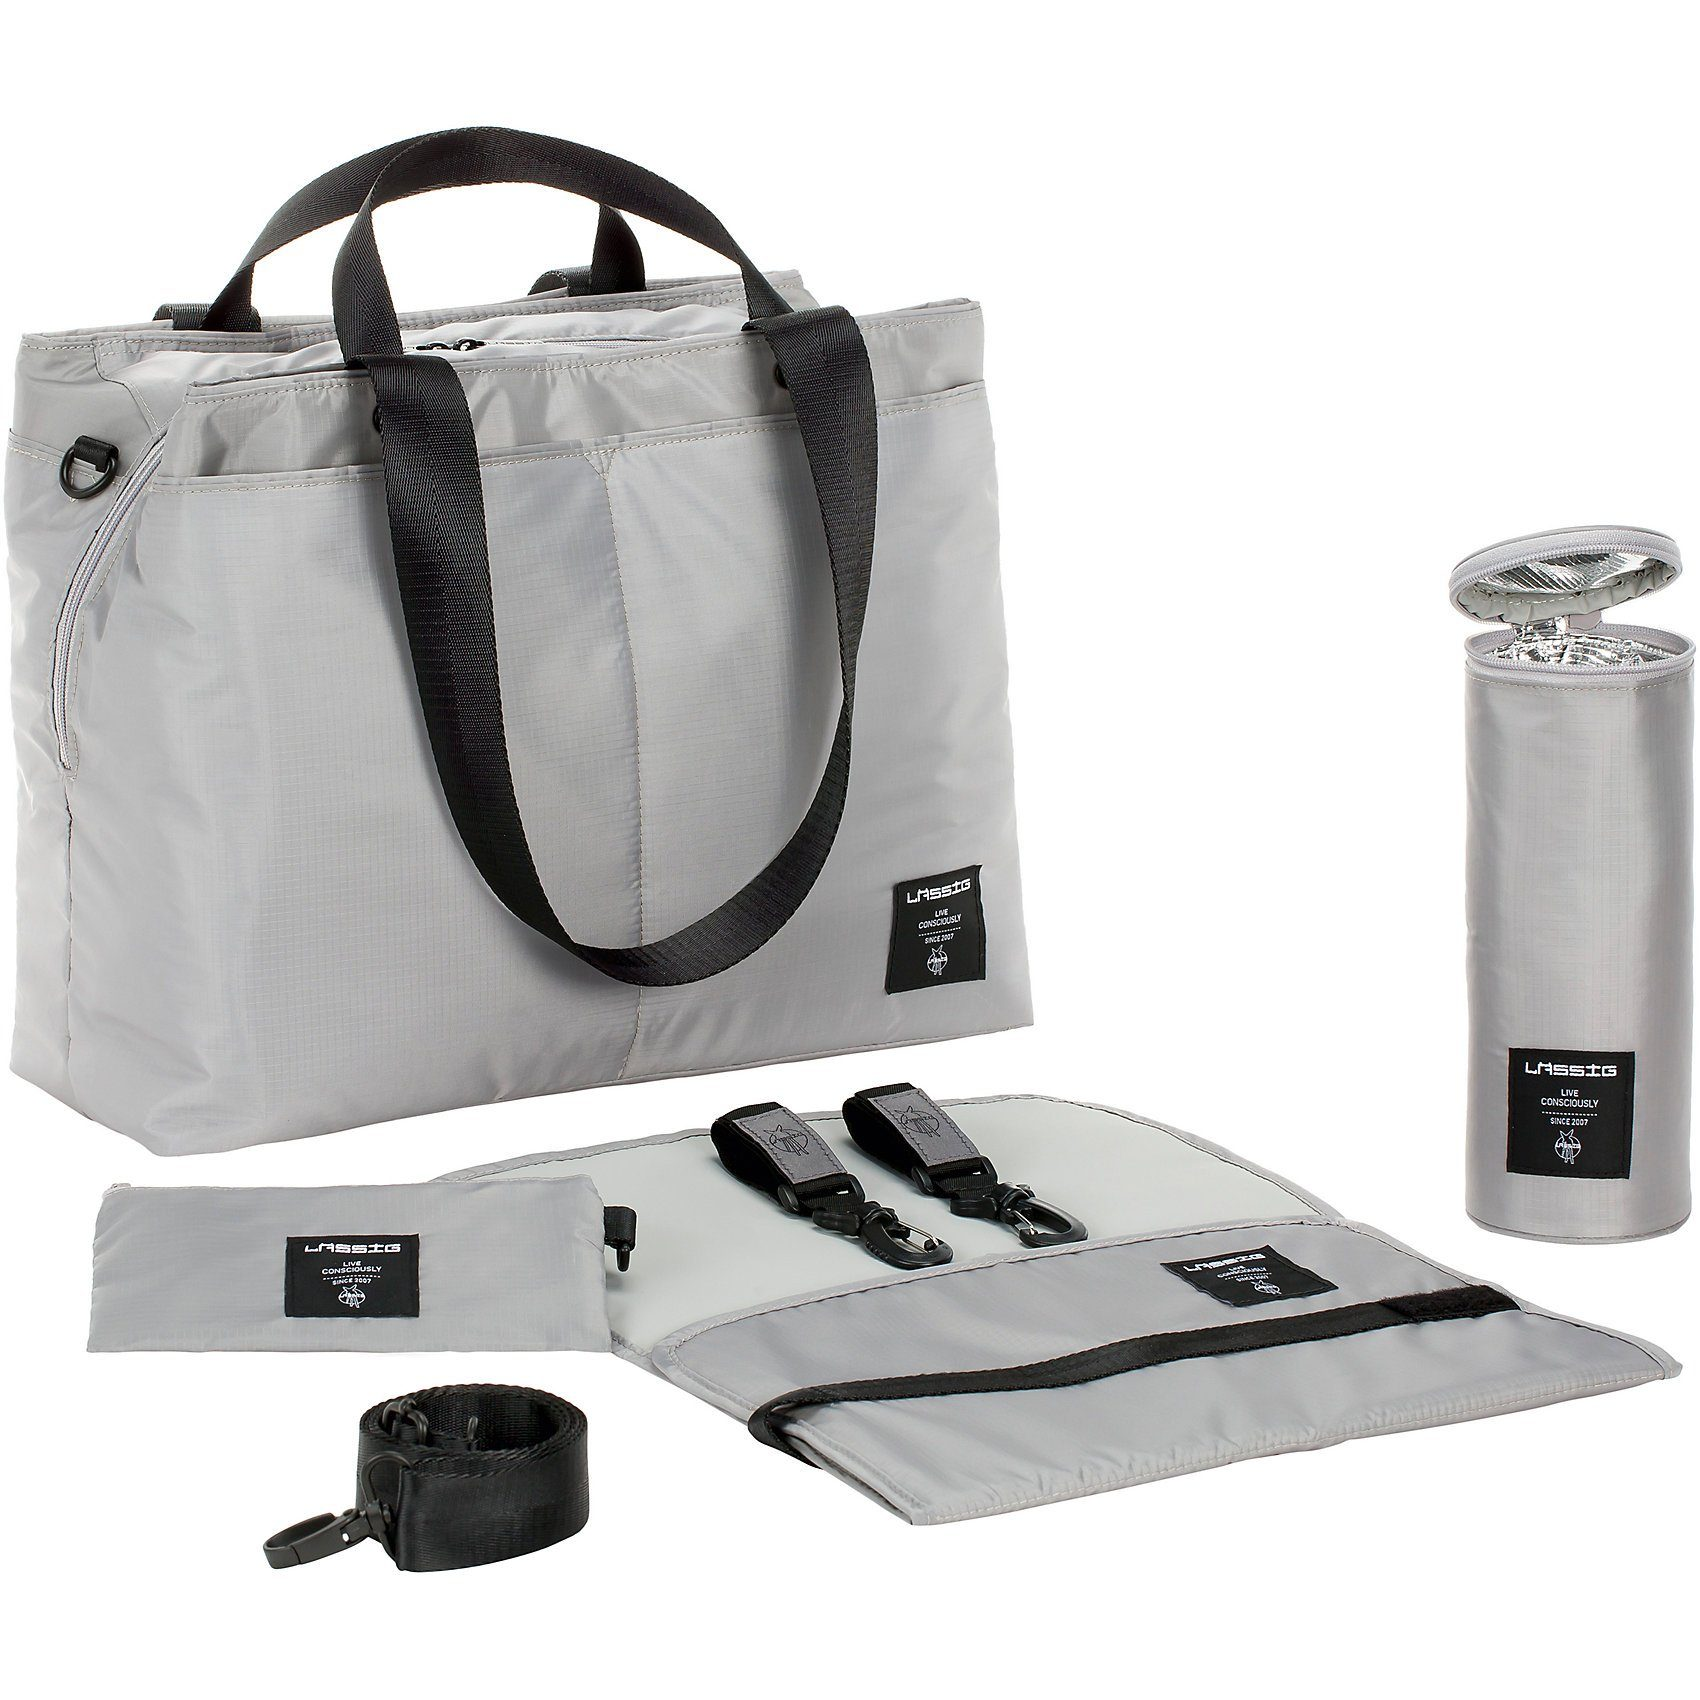 Lässig Wickeltasche Bente Bag, Greenlabel, grey